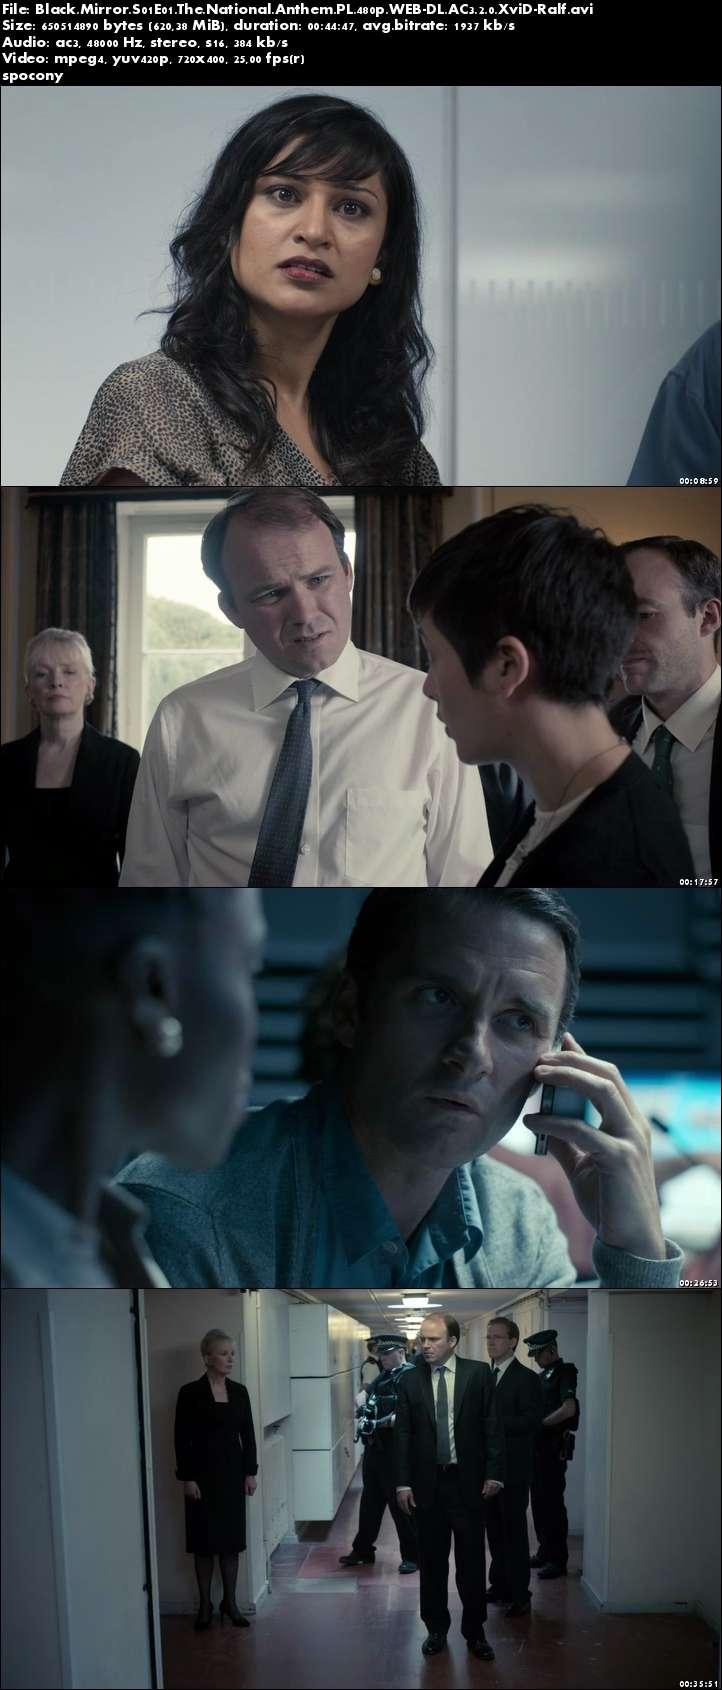 Czarne lustro / Black Mirror (2012) {Sezon 1} PL.480p.WEB-DL.AC3.2.0.XviD-Ralf [Lektor PL]